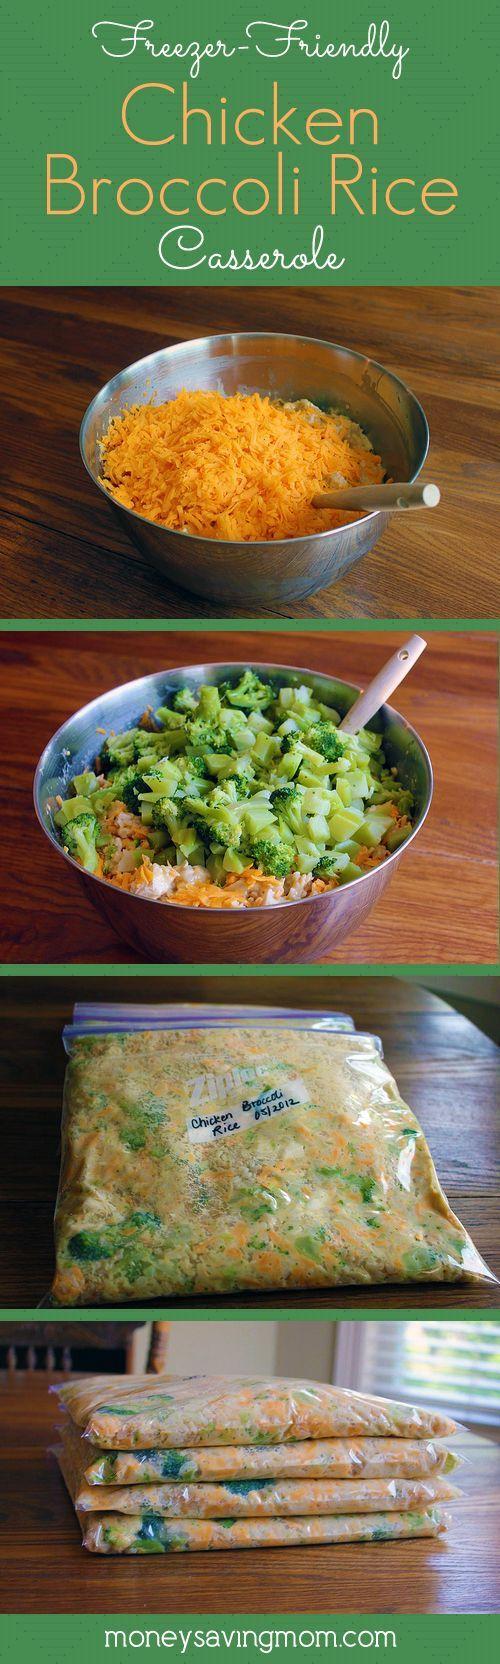 Broccoli Rice Casserole - Freezer Friendly Chicken Broccoli Rice ...